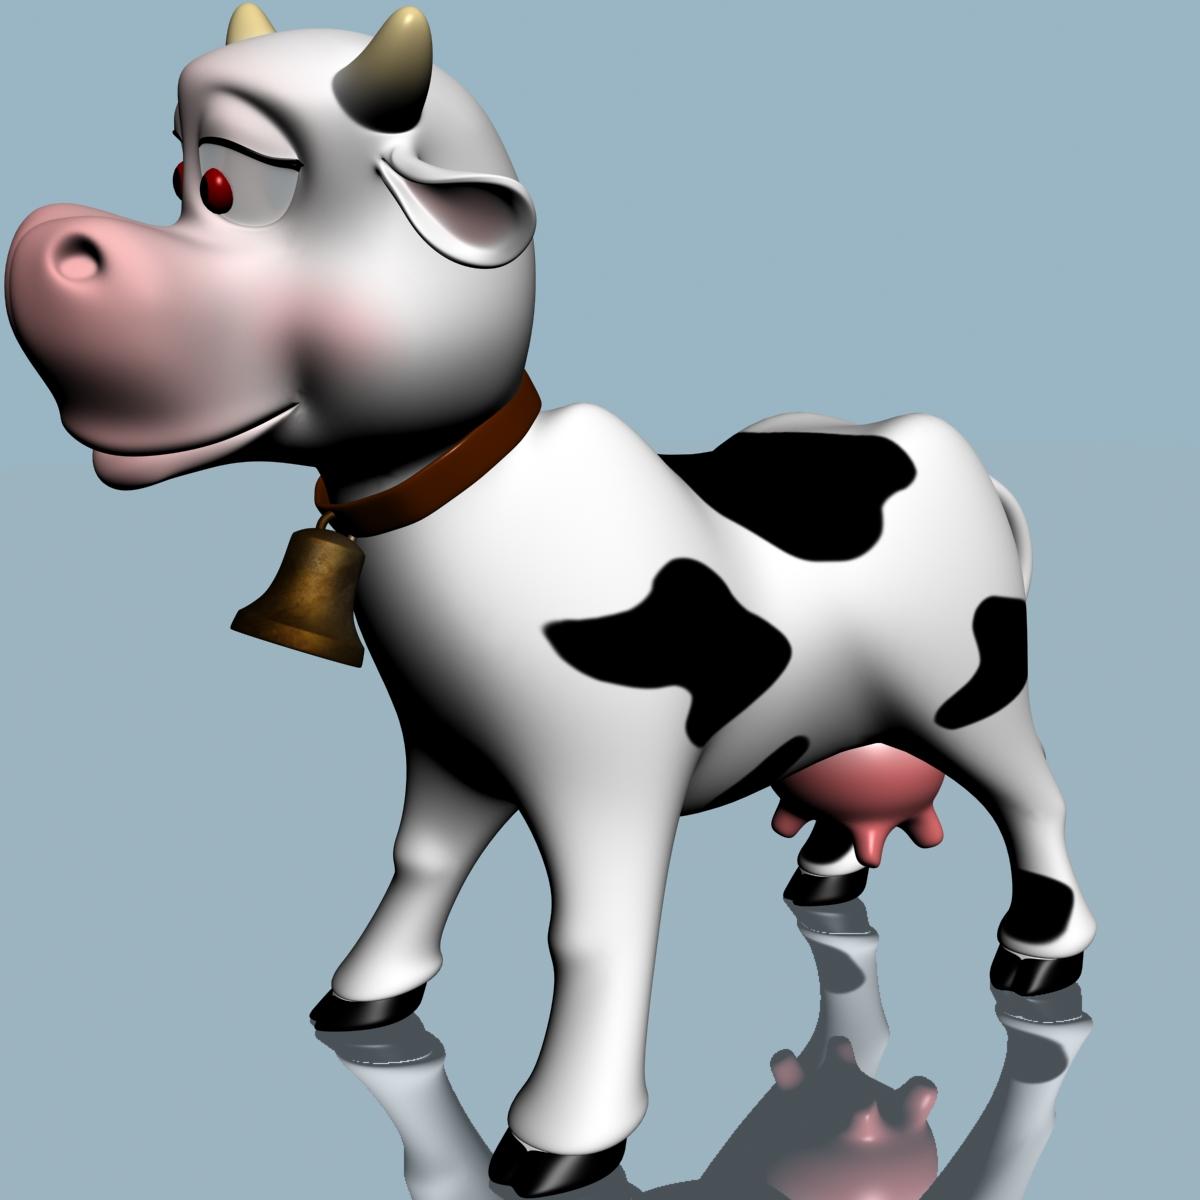 cartoon cow rigged 3d model 3ds max fbx  obj 166110